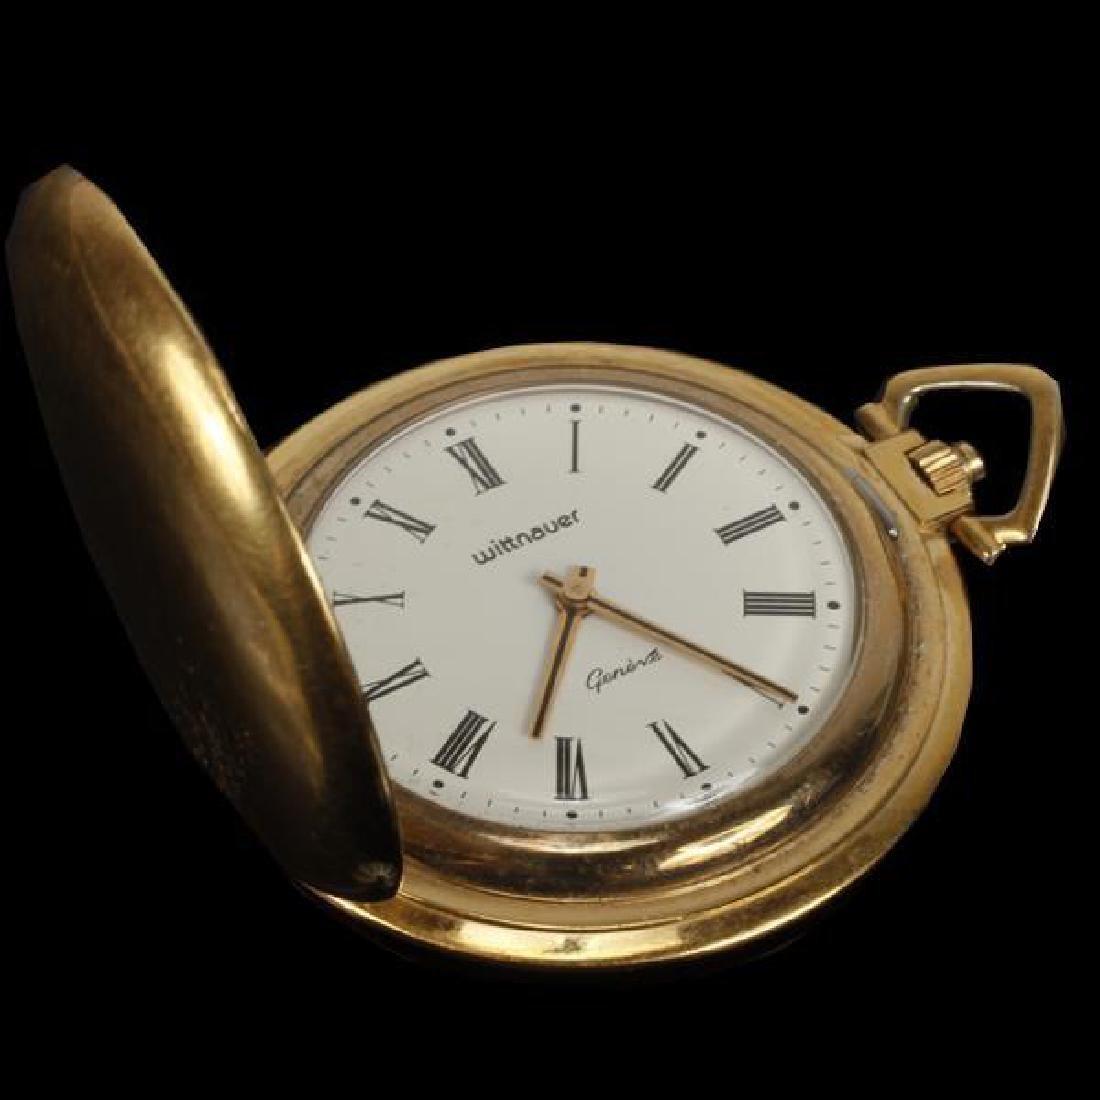 Geneve Gold filled pocket watch